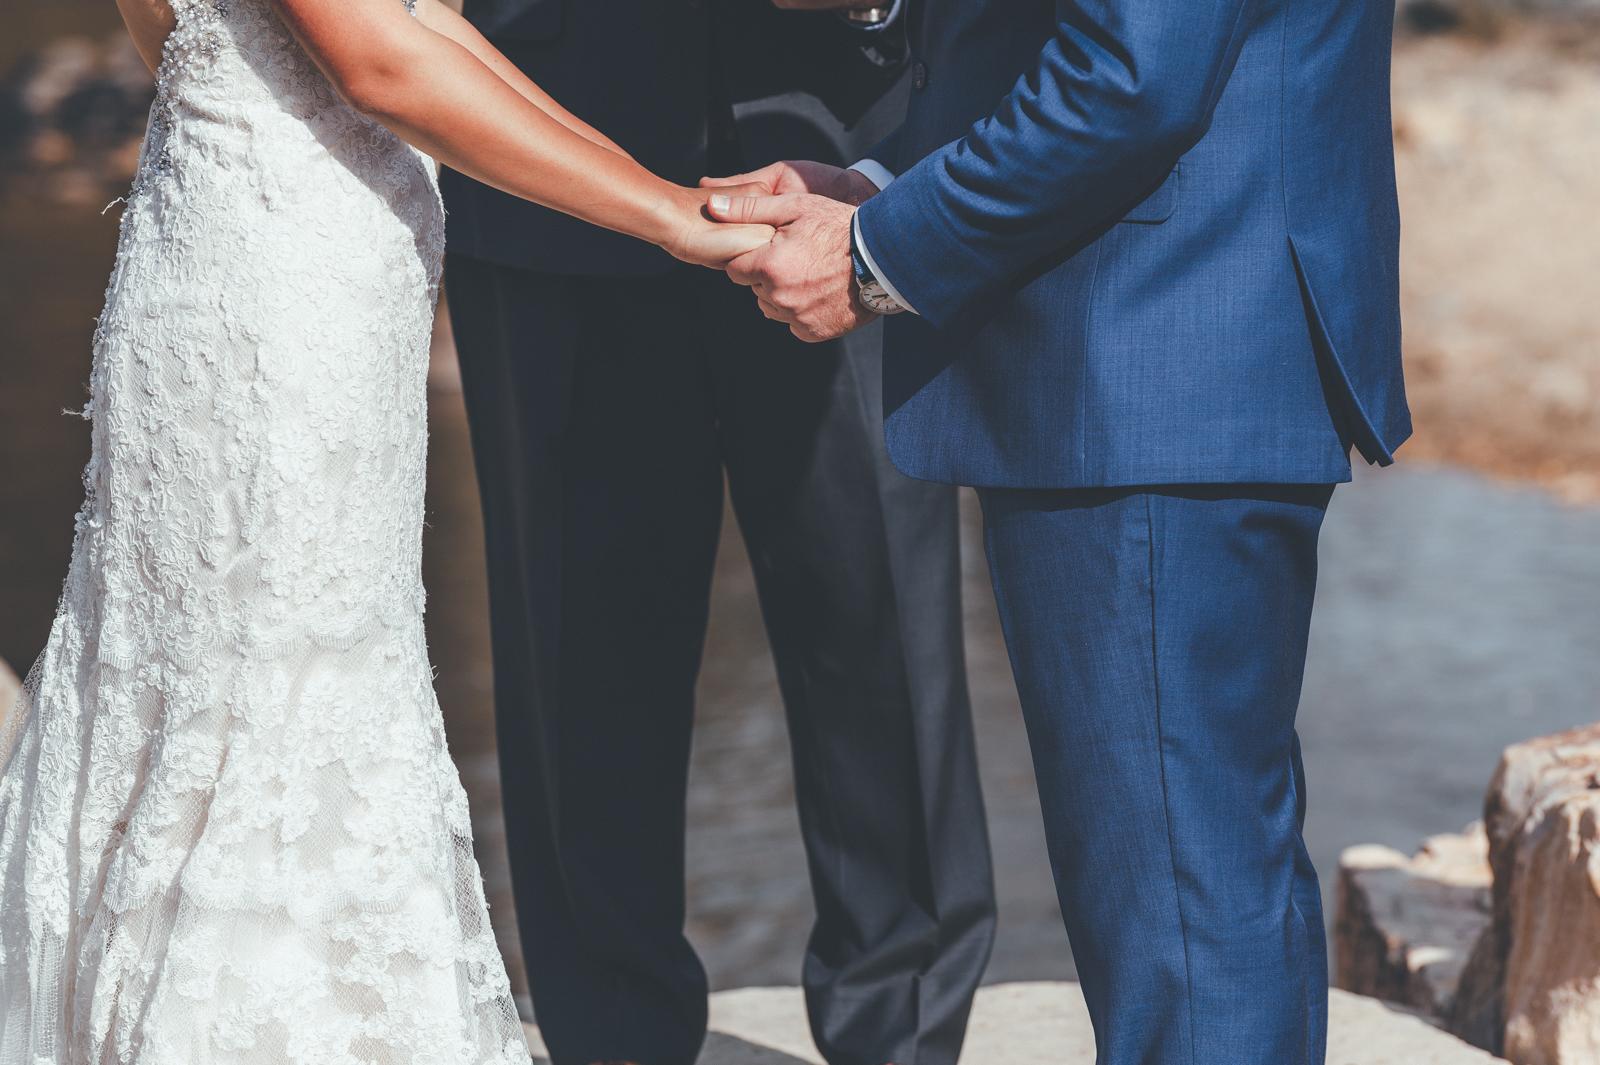 ChadFahnestockPhotography-estes-park-wedding-photography-020.jpg